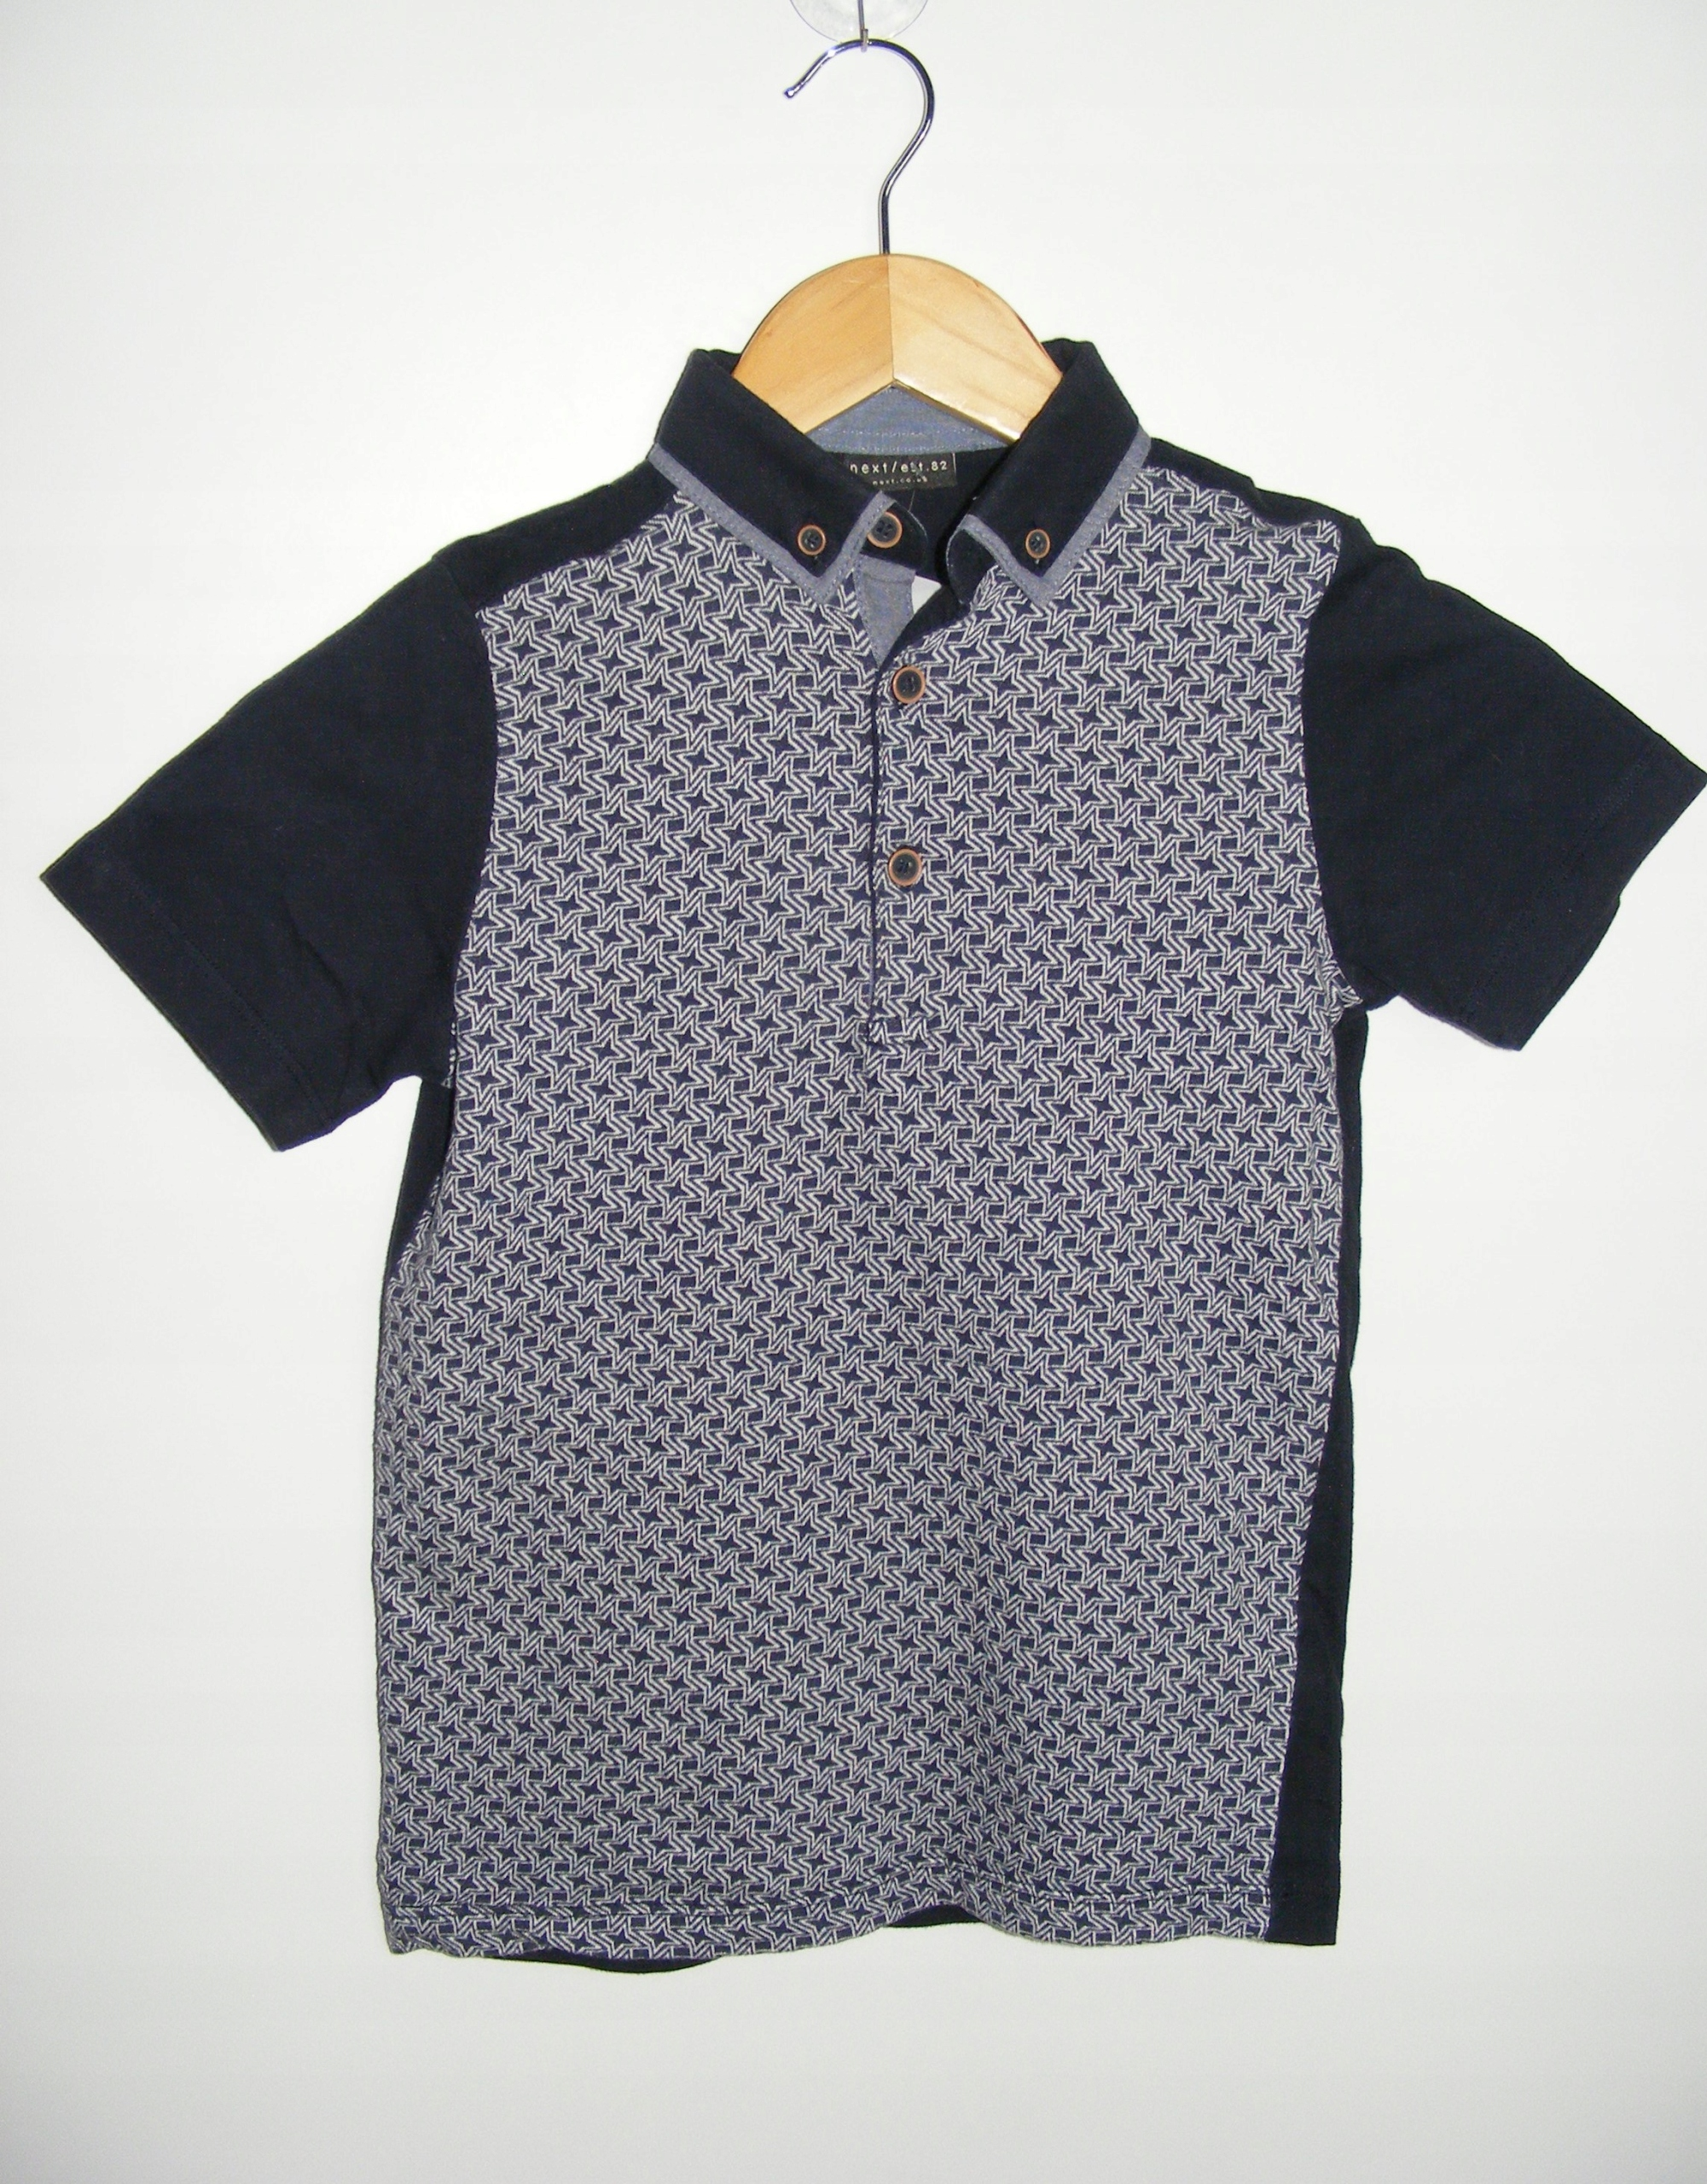 NEXT koszulka polo polówka R 7 lat 122 cm